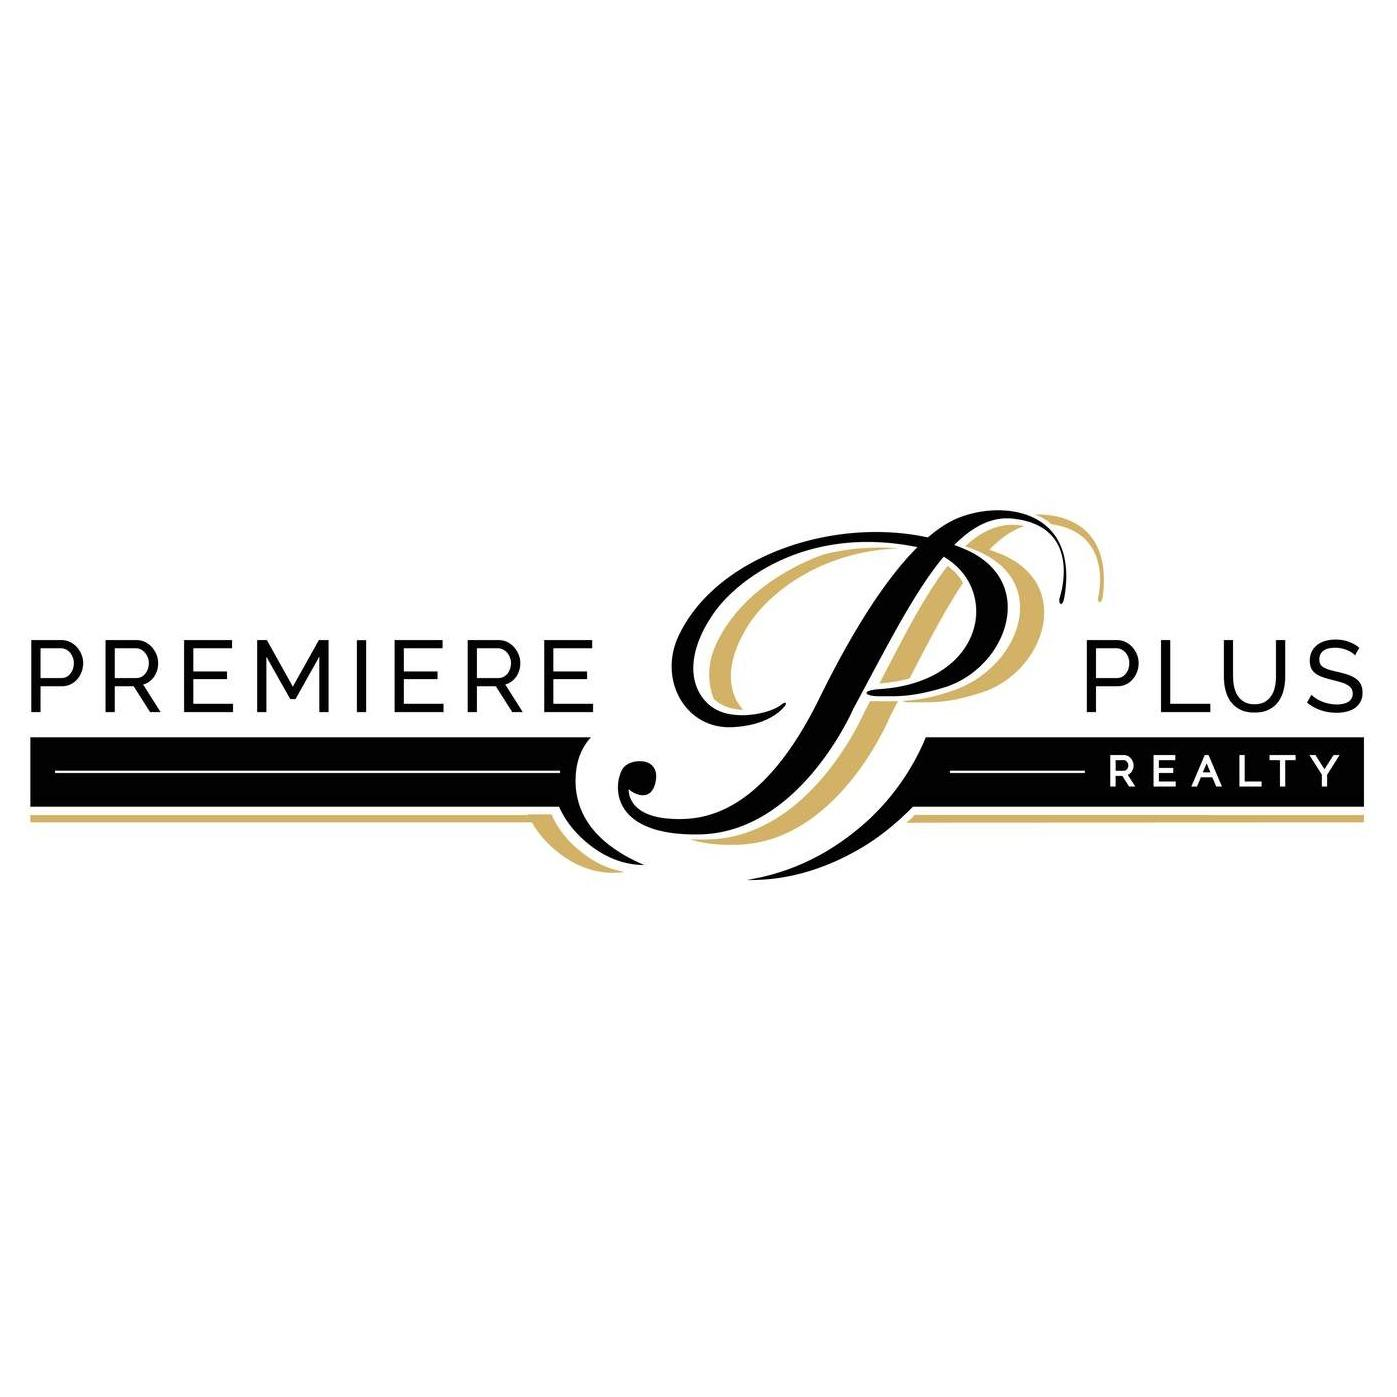 Bill Hogerhuis - Premiere Plus Realty image 0